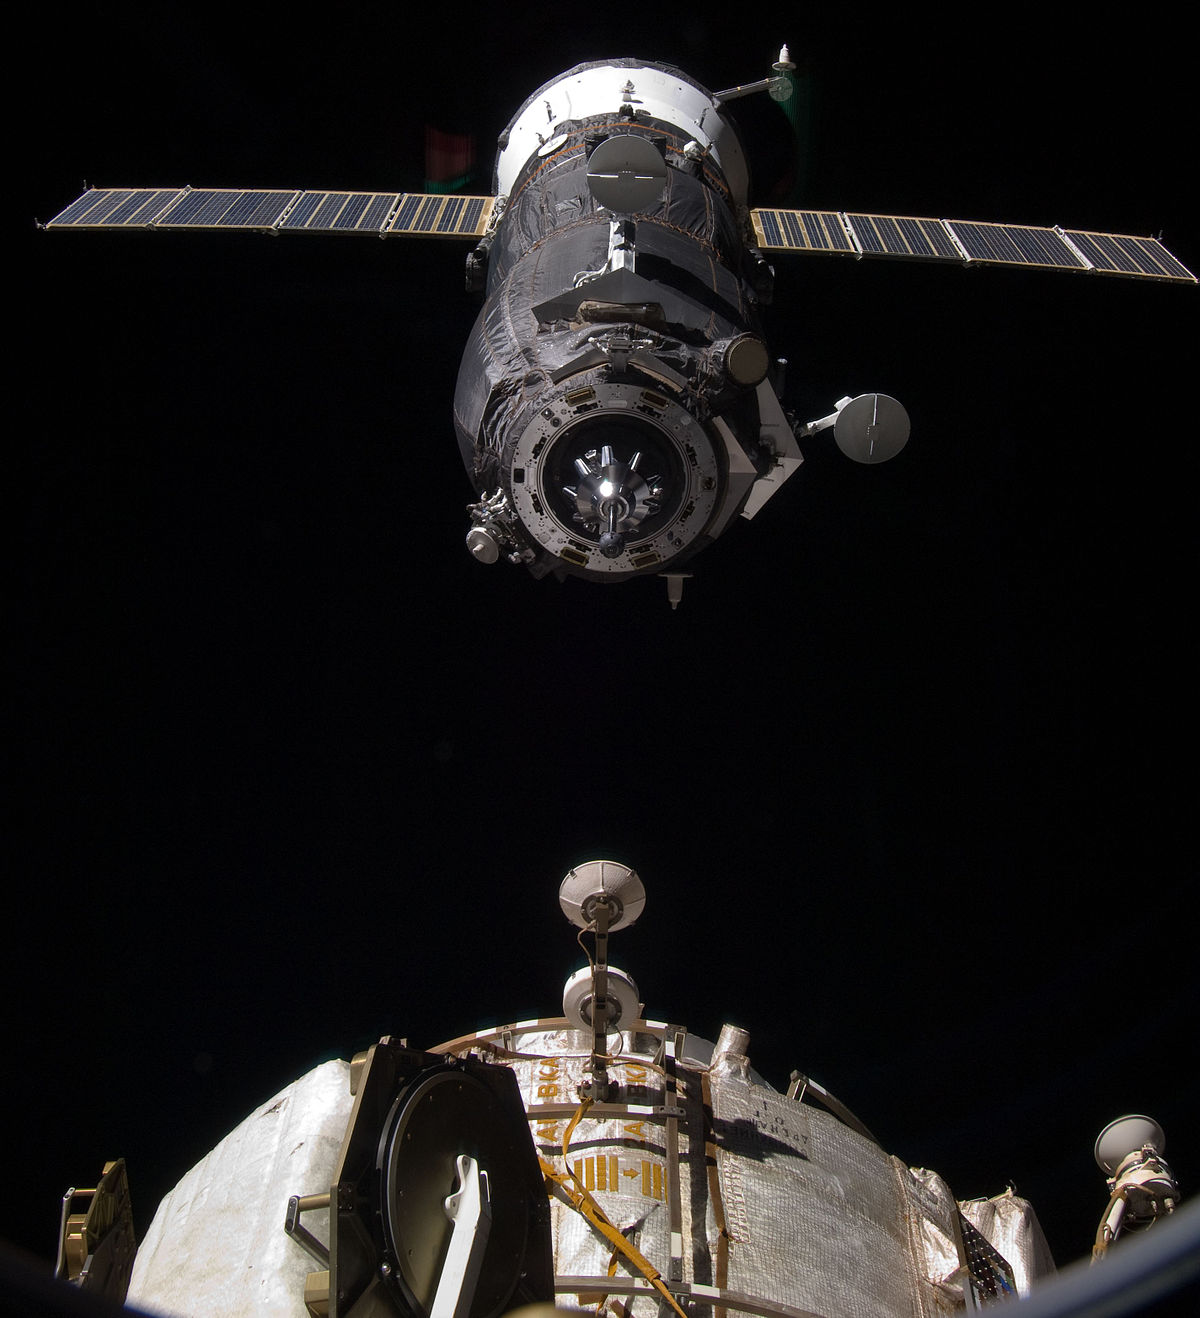 Kurs (docking navigation system) - Wikipedia